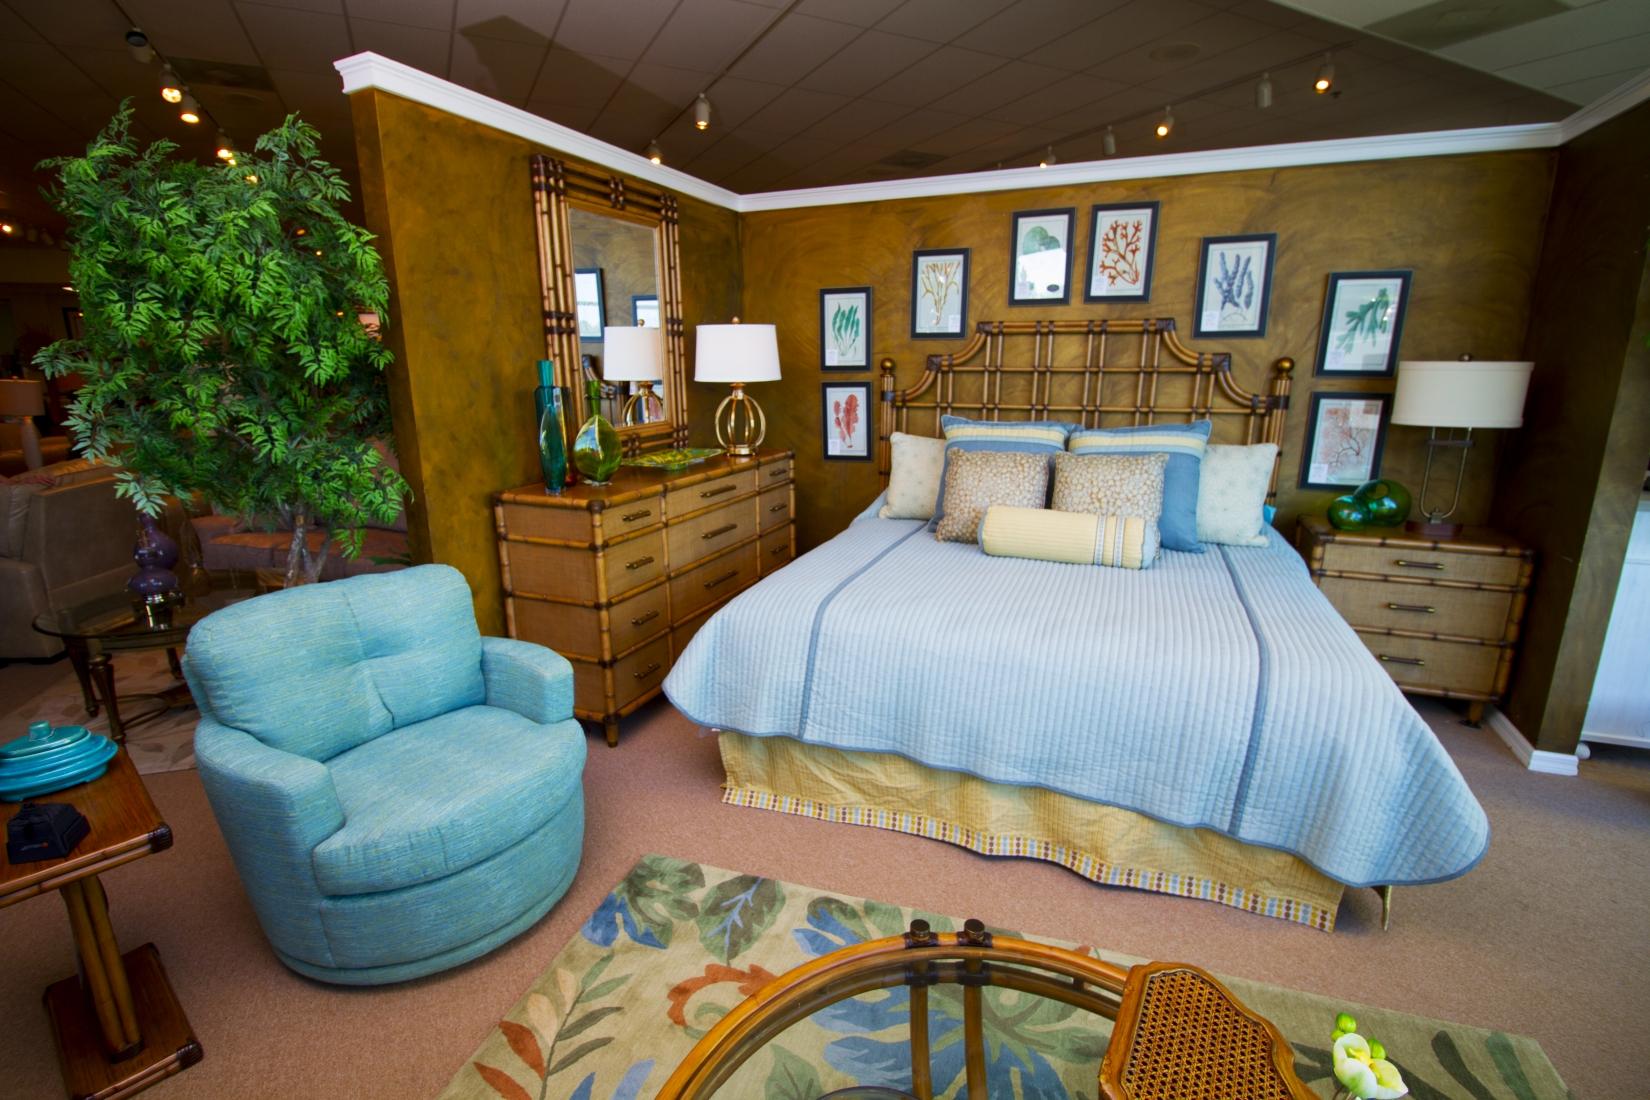 Whiteu0027s Furniture U0026 Accessories | 13970 South US Highway 441 | Summerfield,  FL 34491 | 352.245.8400